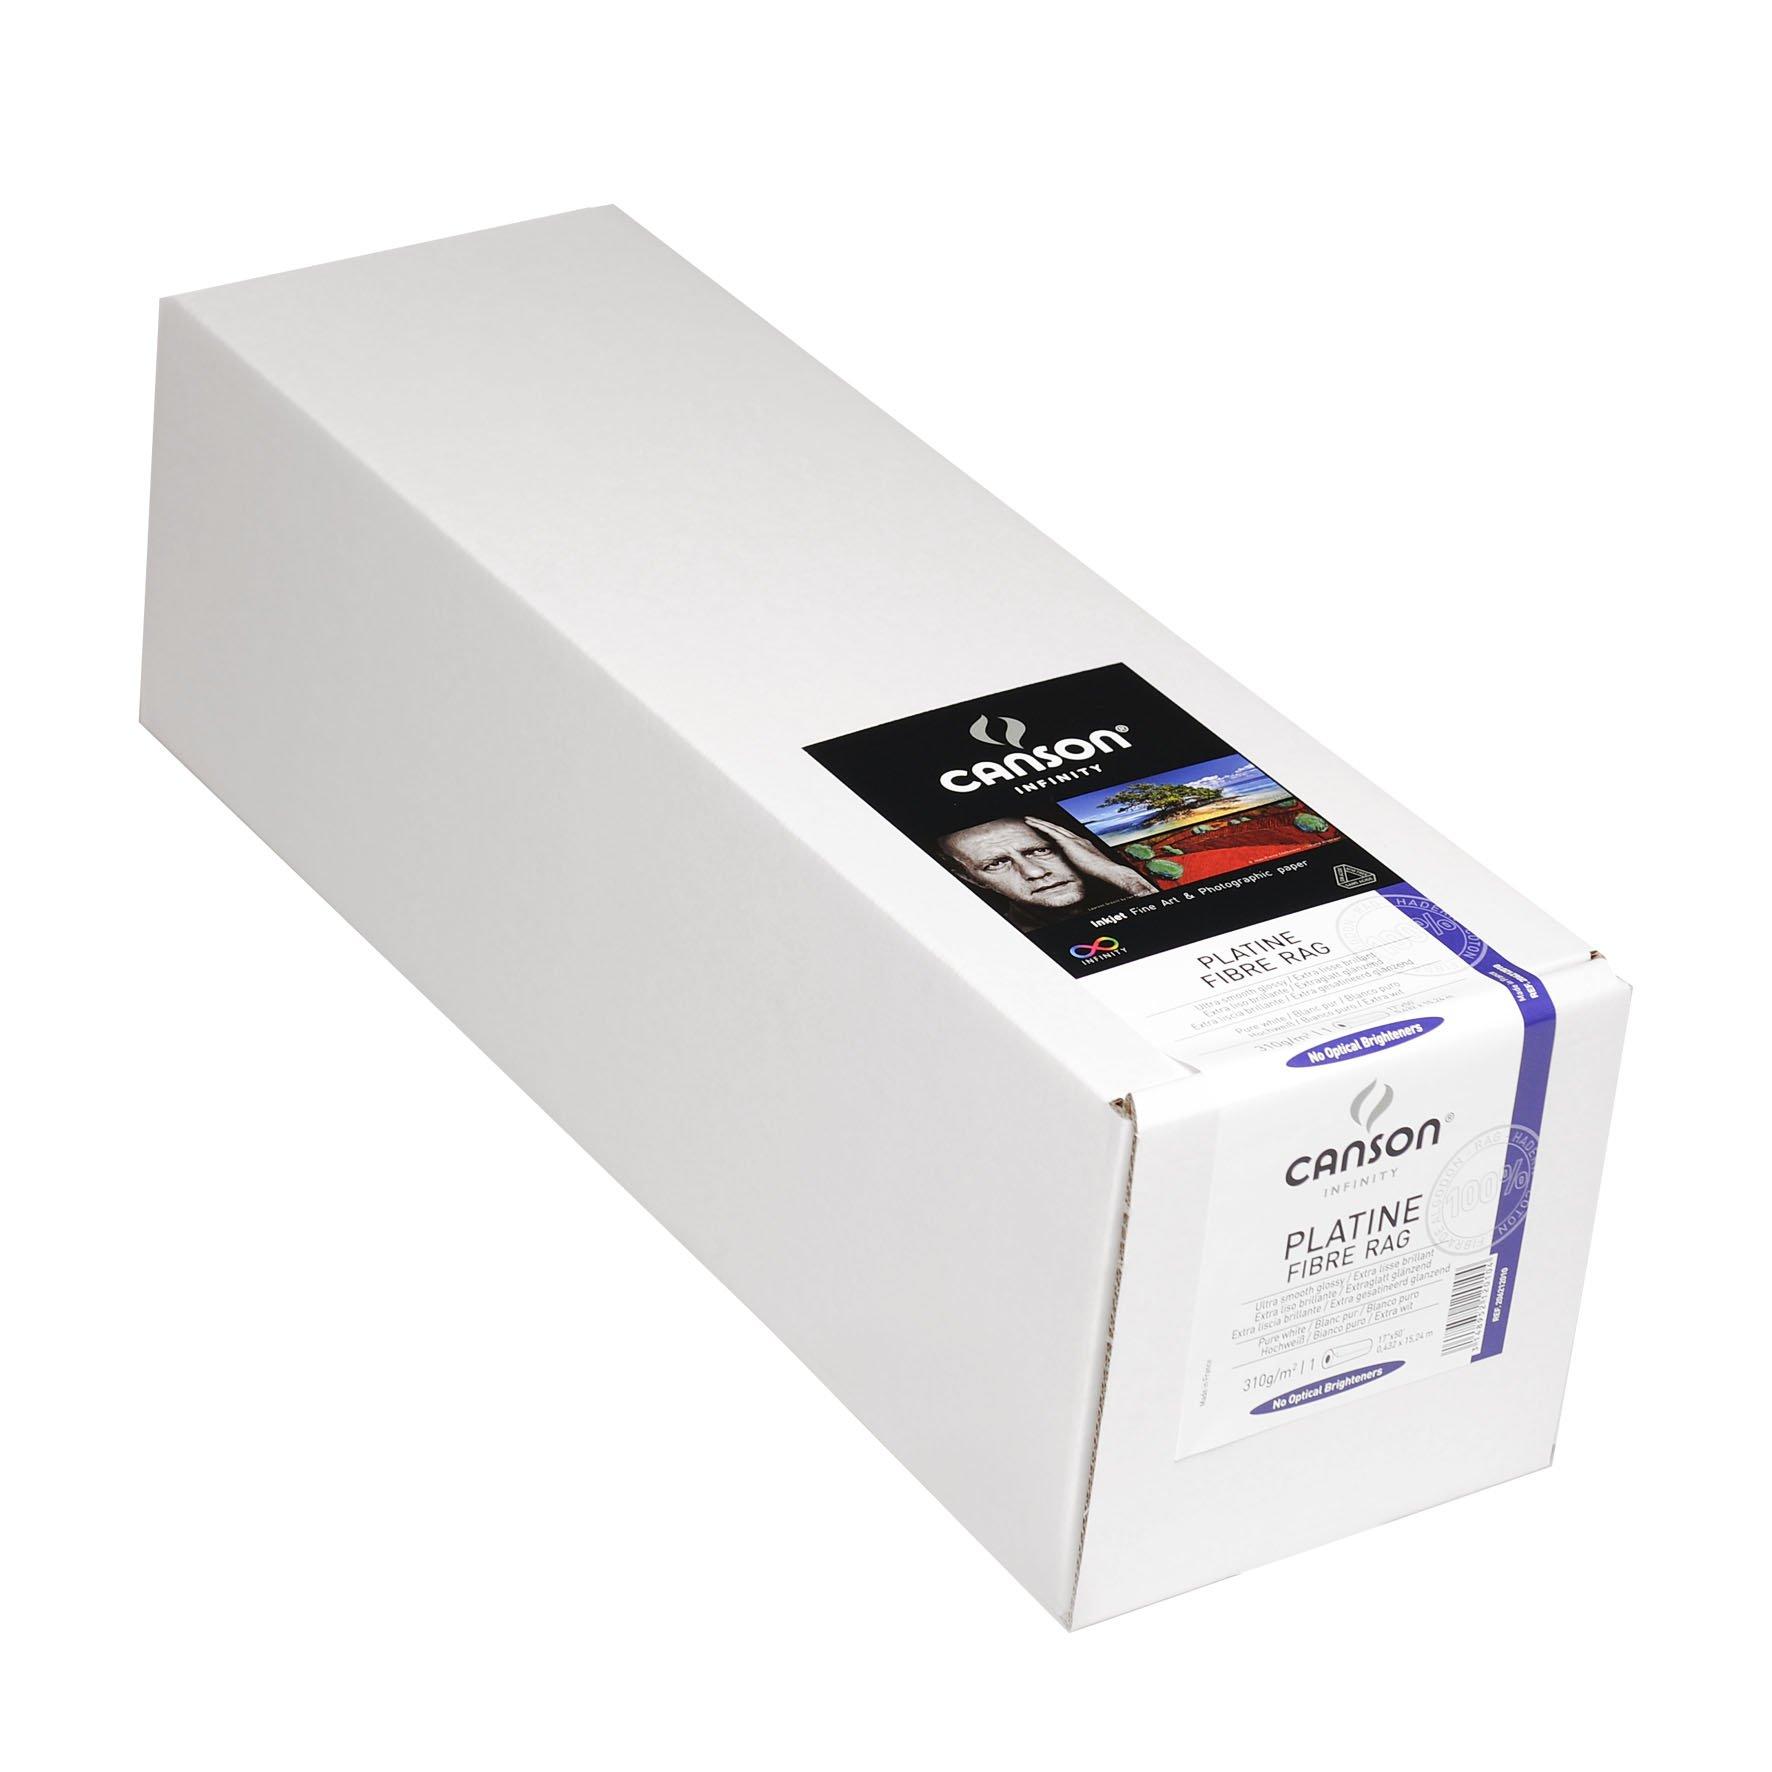 Canson Infinity Platine Fibre Rag Art Paper, 310 Gram , 17 Inch x 50 Foot Roll